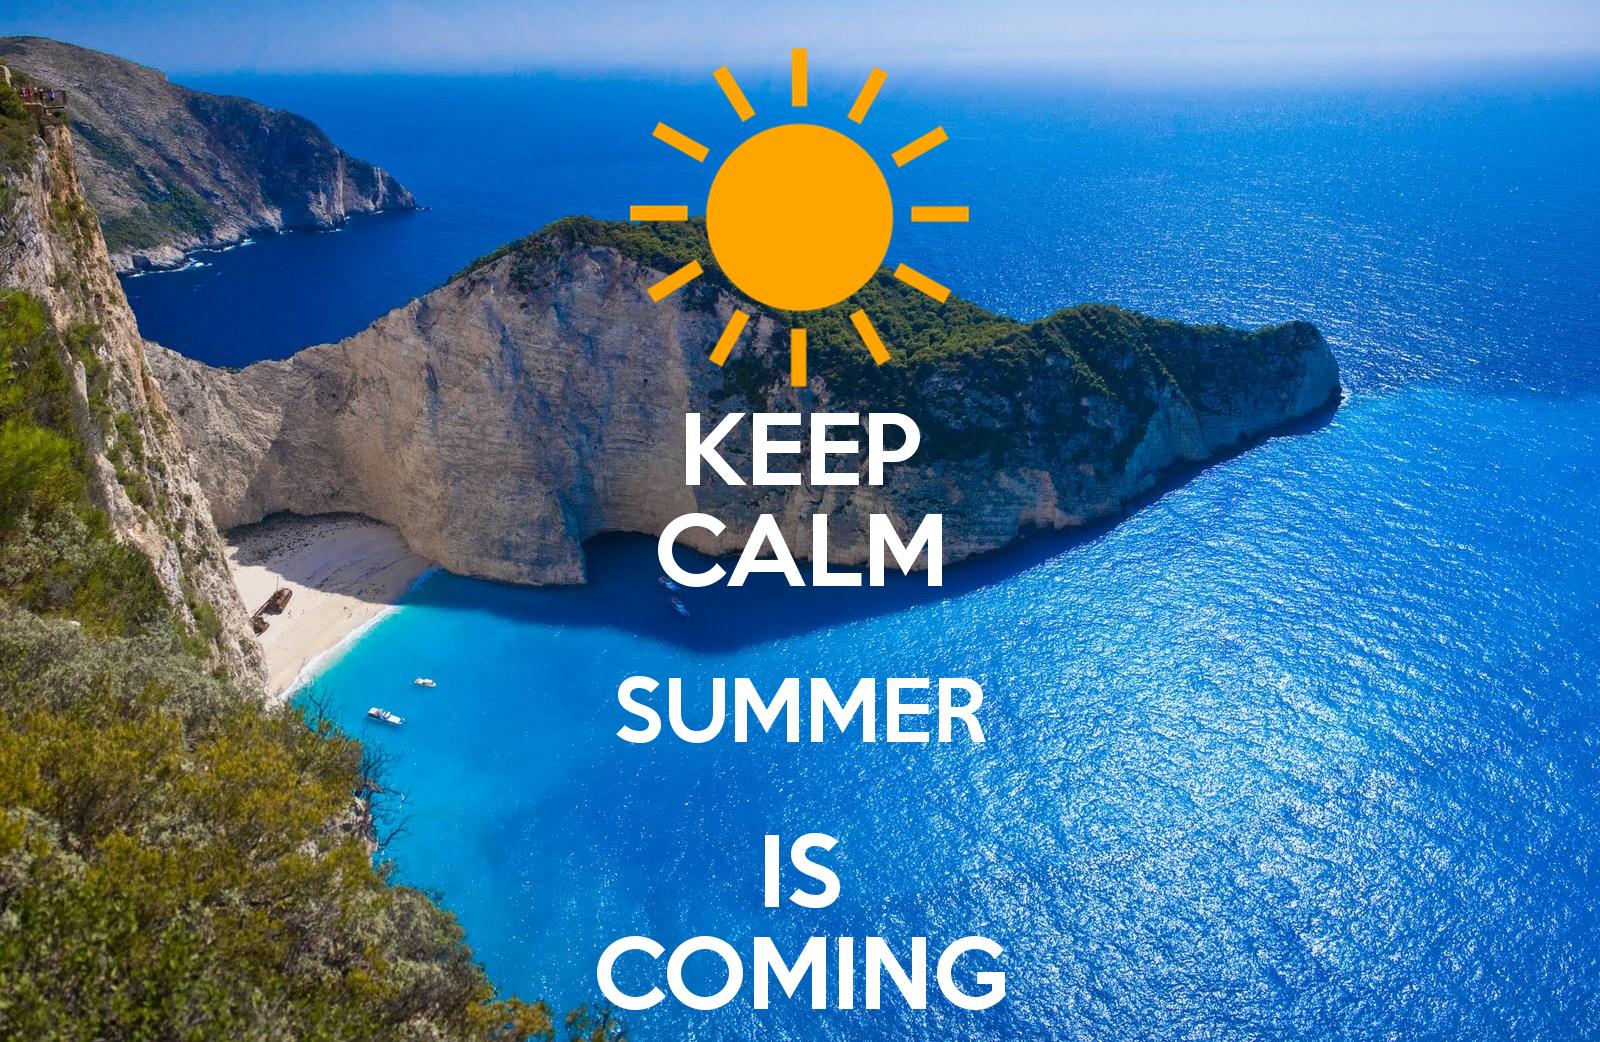 ... 262264 Keep Calm Summer Is Coming Feedyeti.com ...